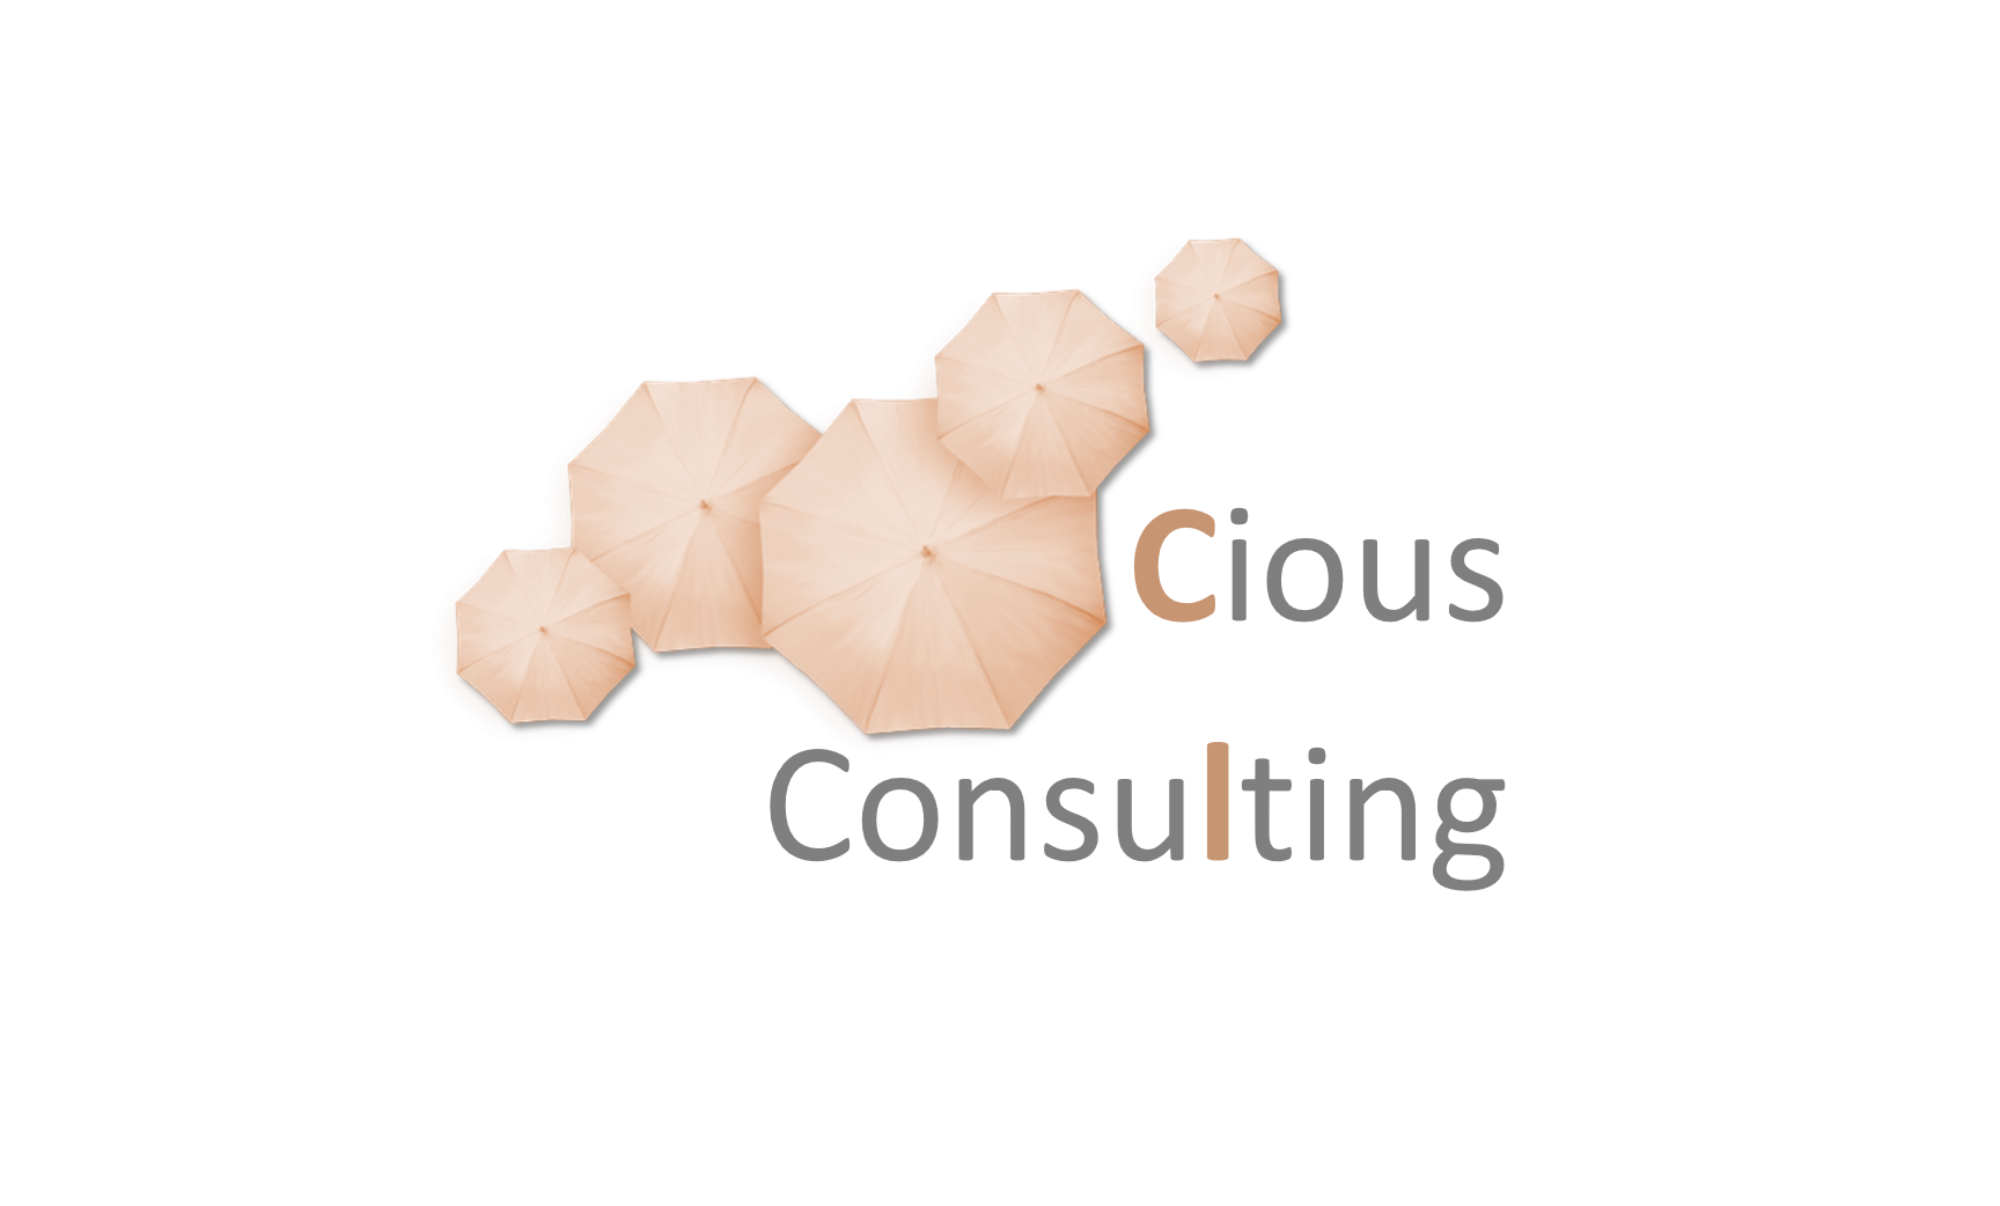 Cious Consulting